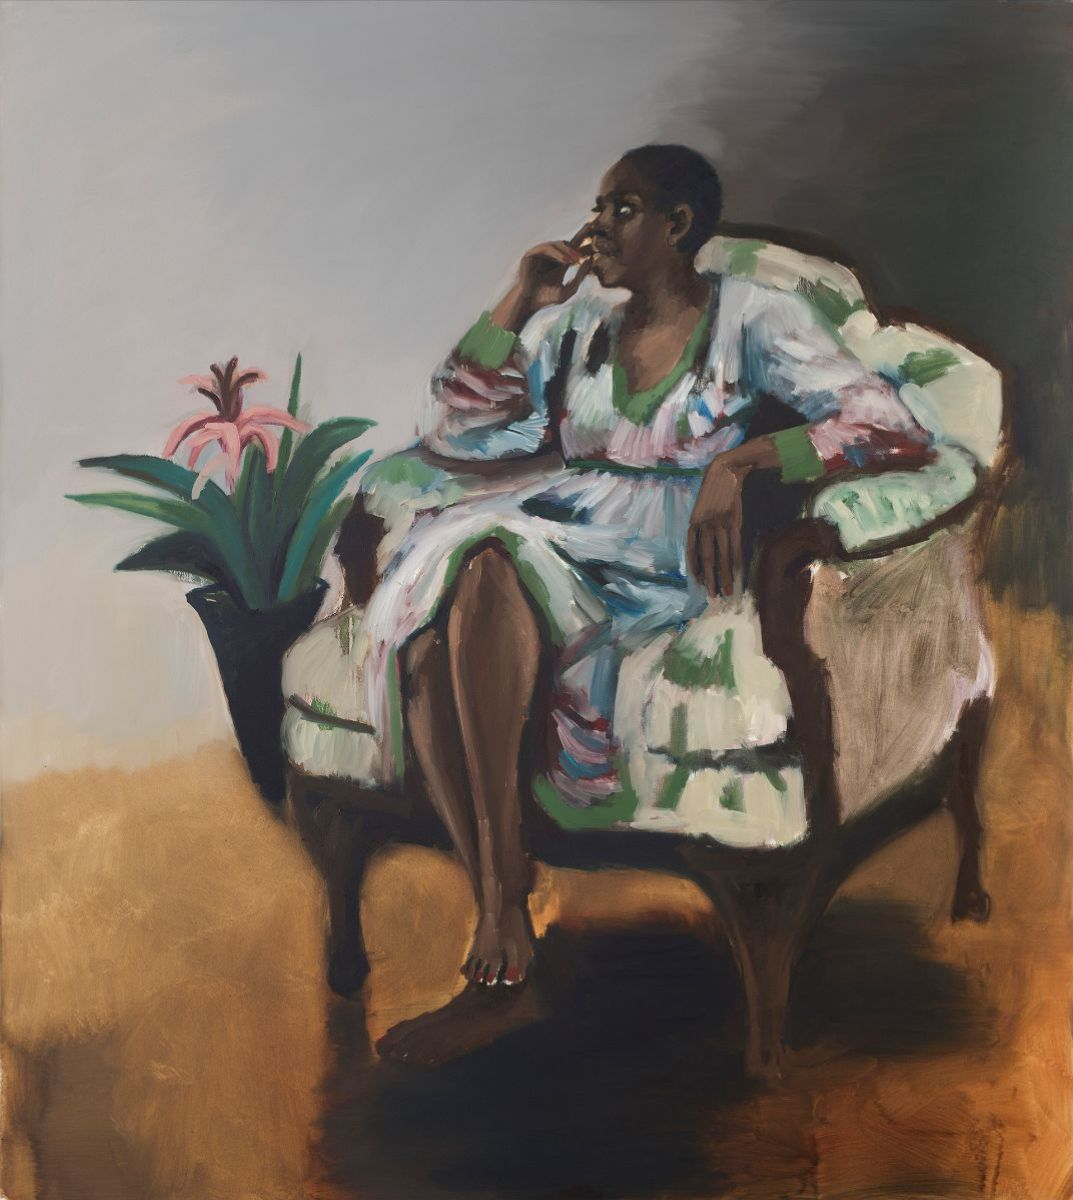 Lynette Yiadom-Boakye, 1 pm, Mason's Yard, 2014, oil on canvas, Private Collection, © Lynette Yiadom-Boakye, courtesy of the artist, Jack Shainman Gallery, New York, and Corvi-Mora, London